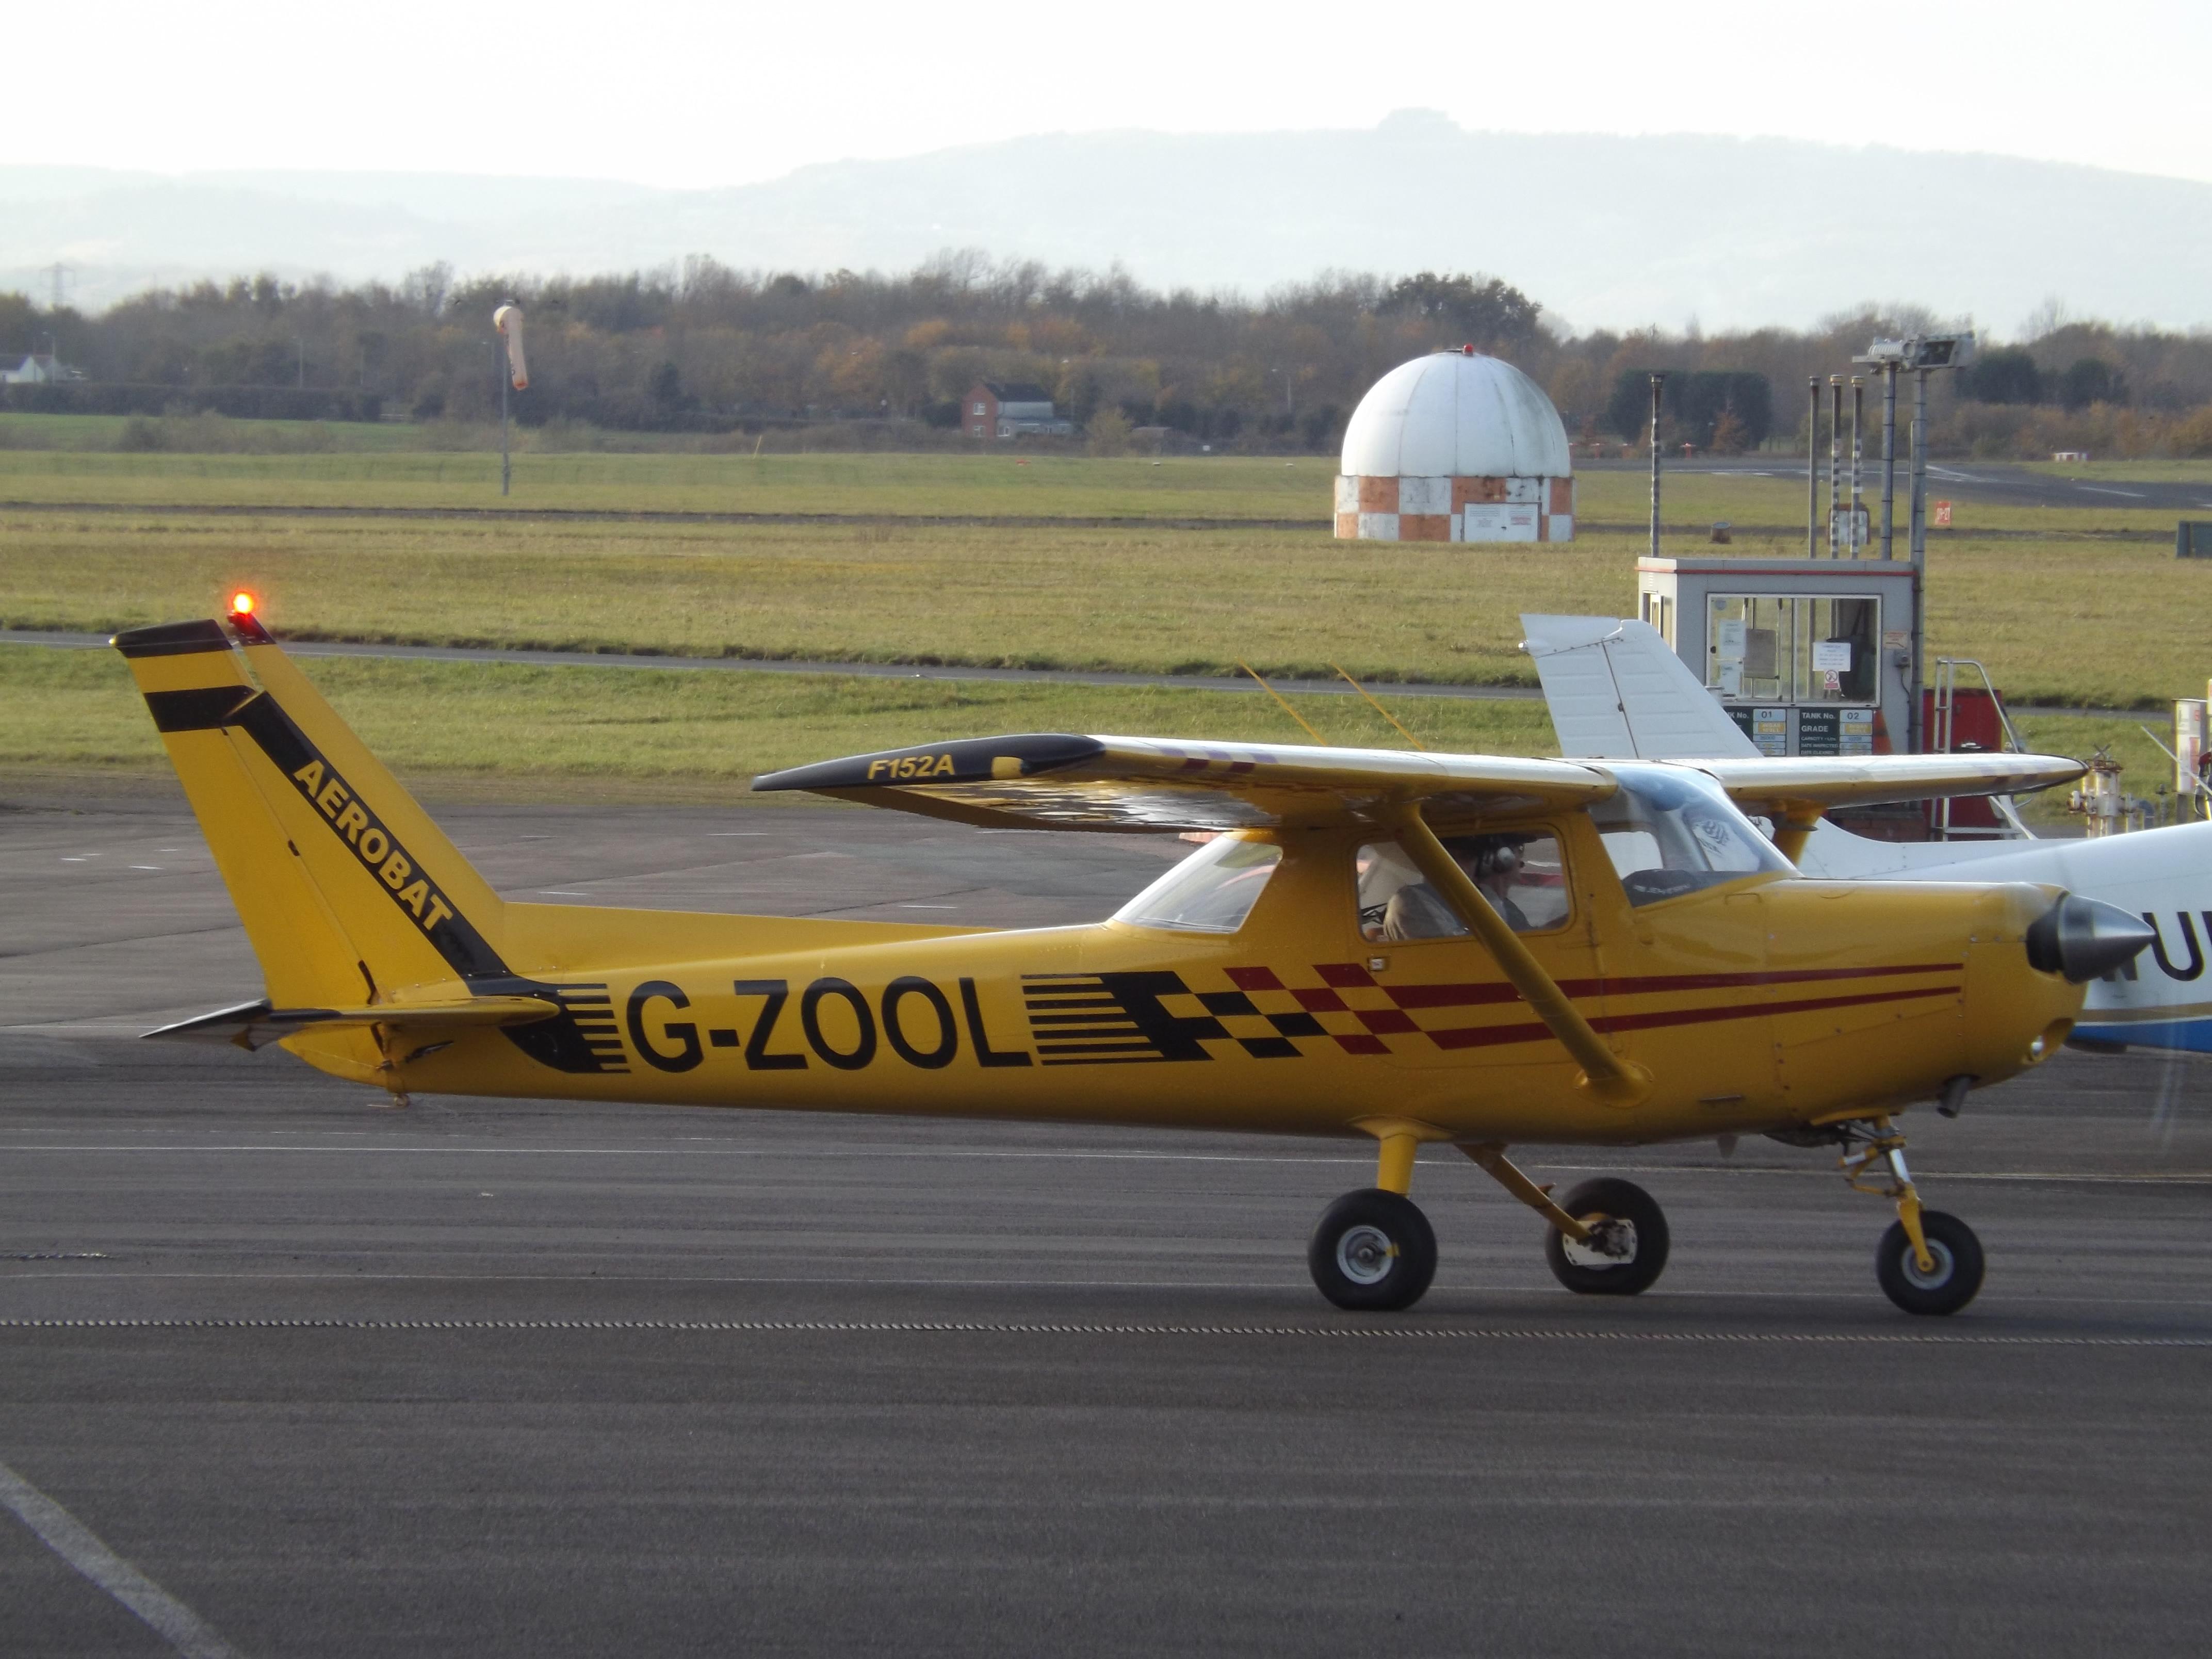 File:G-ZOOL Reims Cessna 152 Private (40005821514) jpg